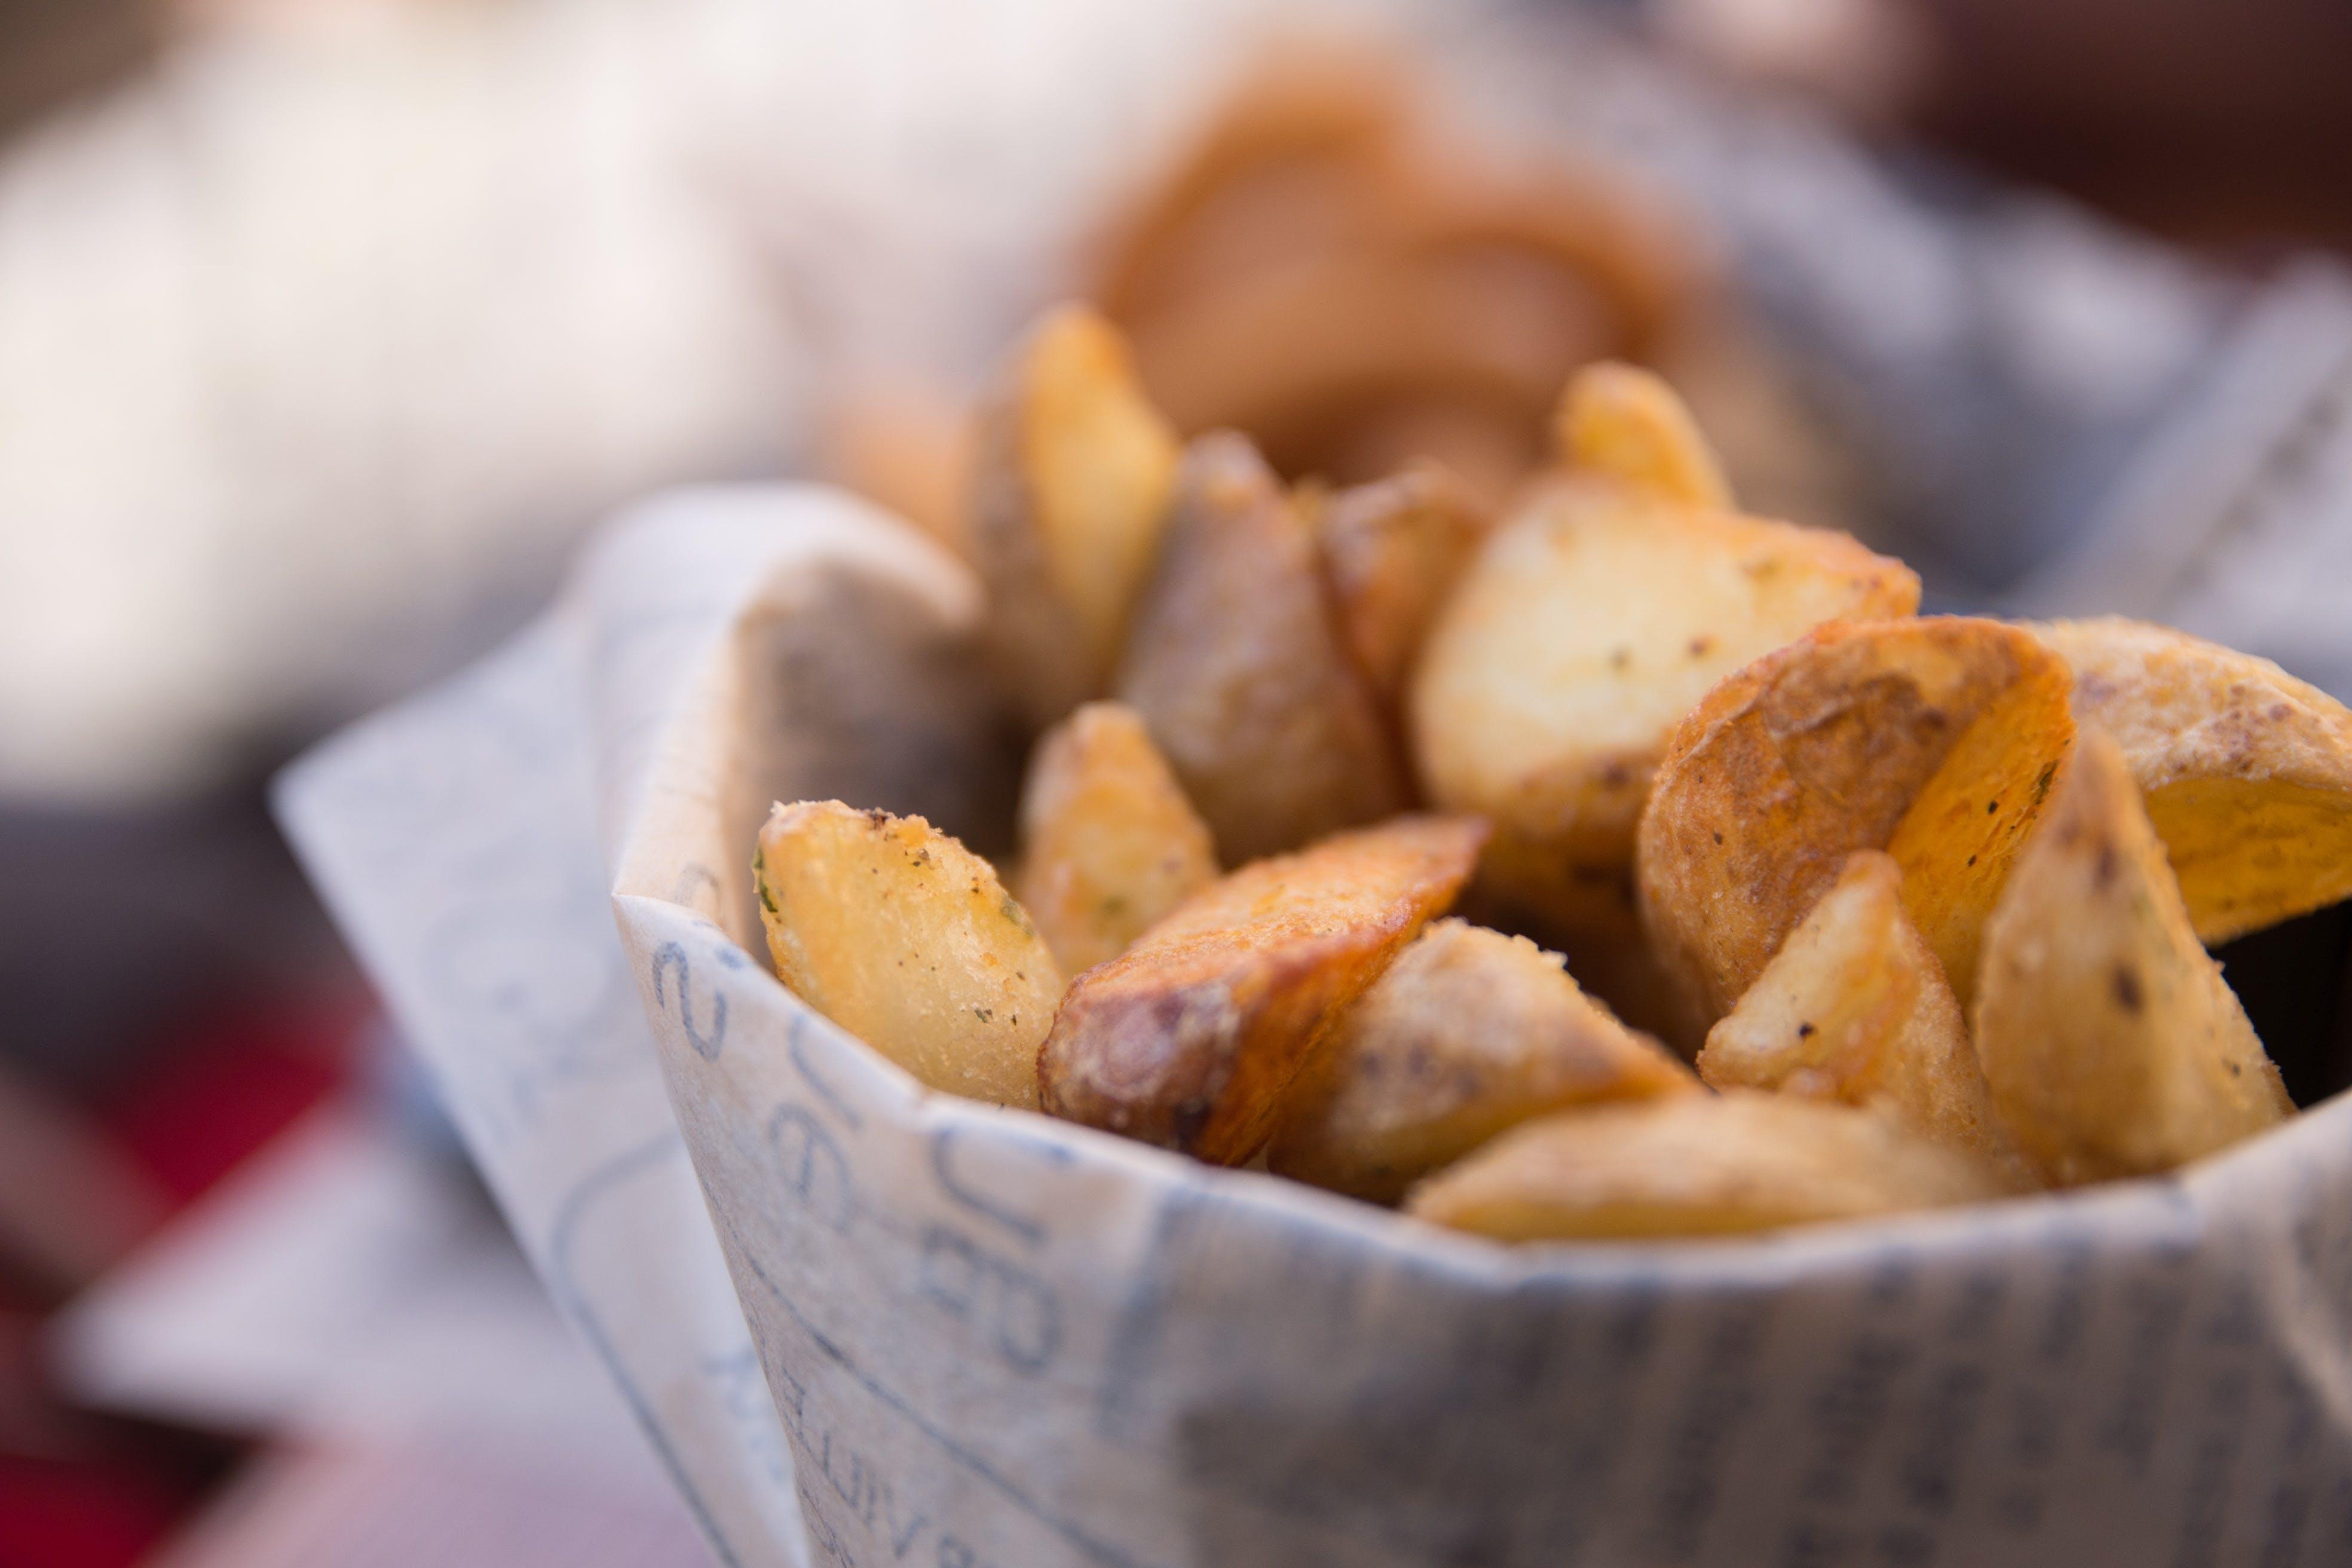 Close Up Photo of Potato Wedges